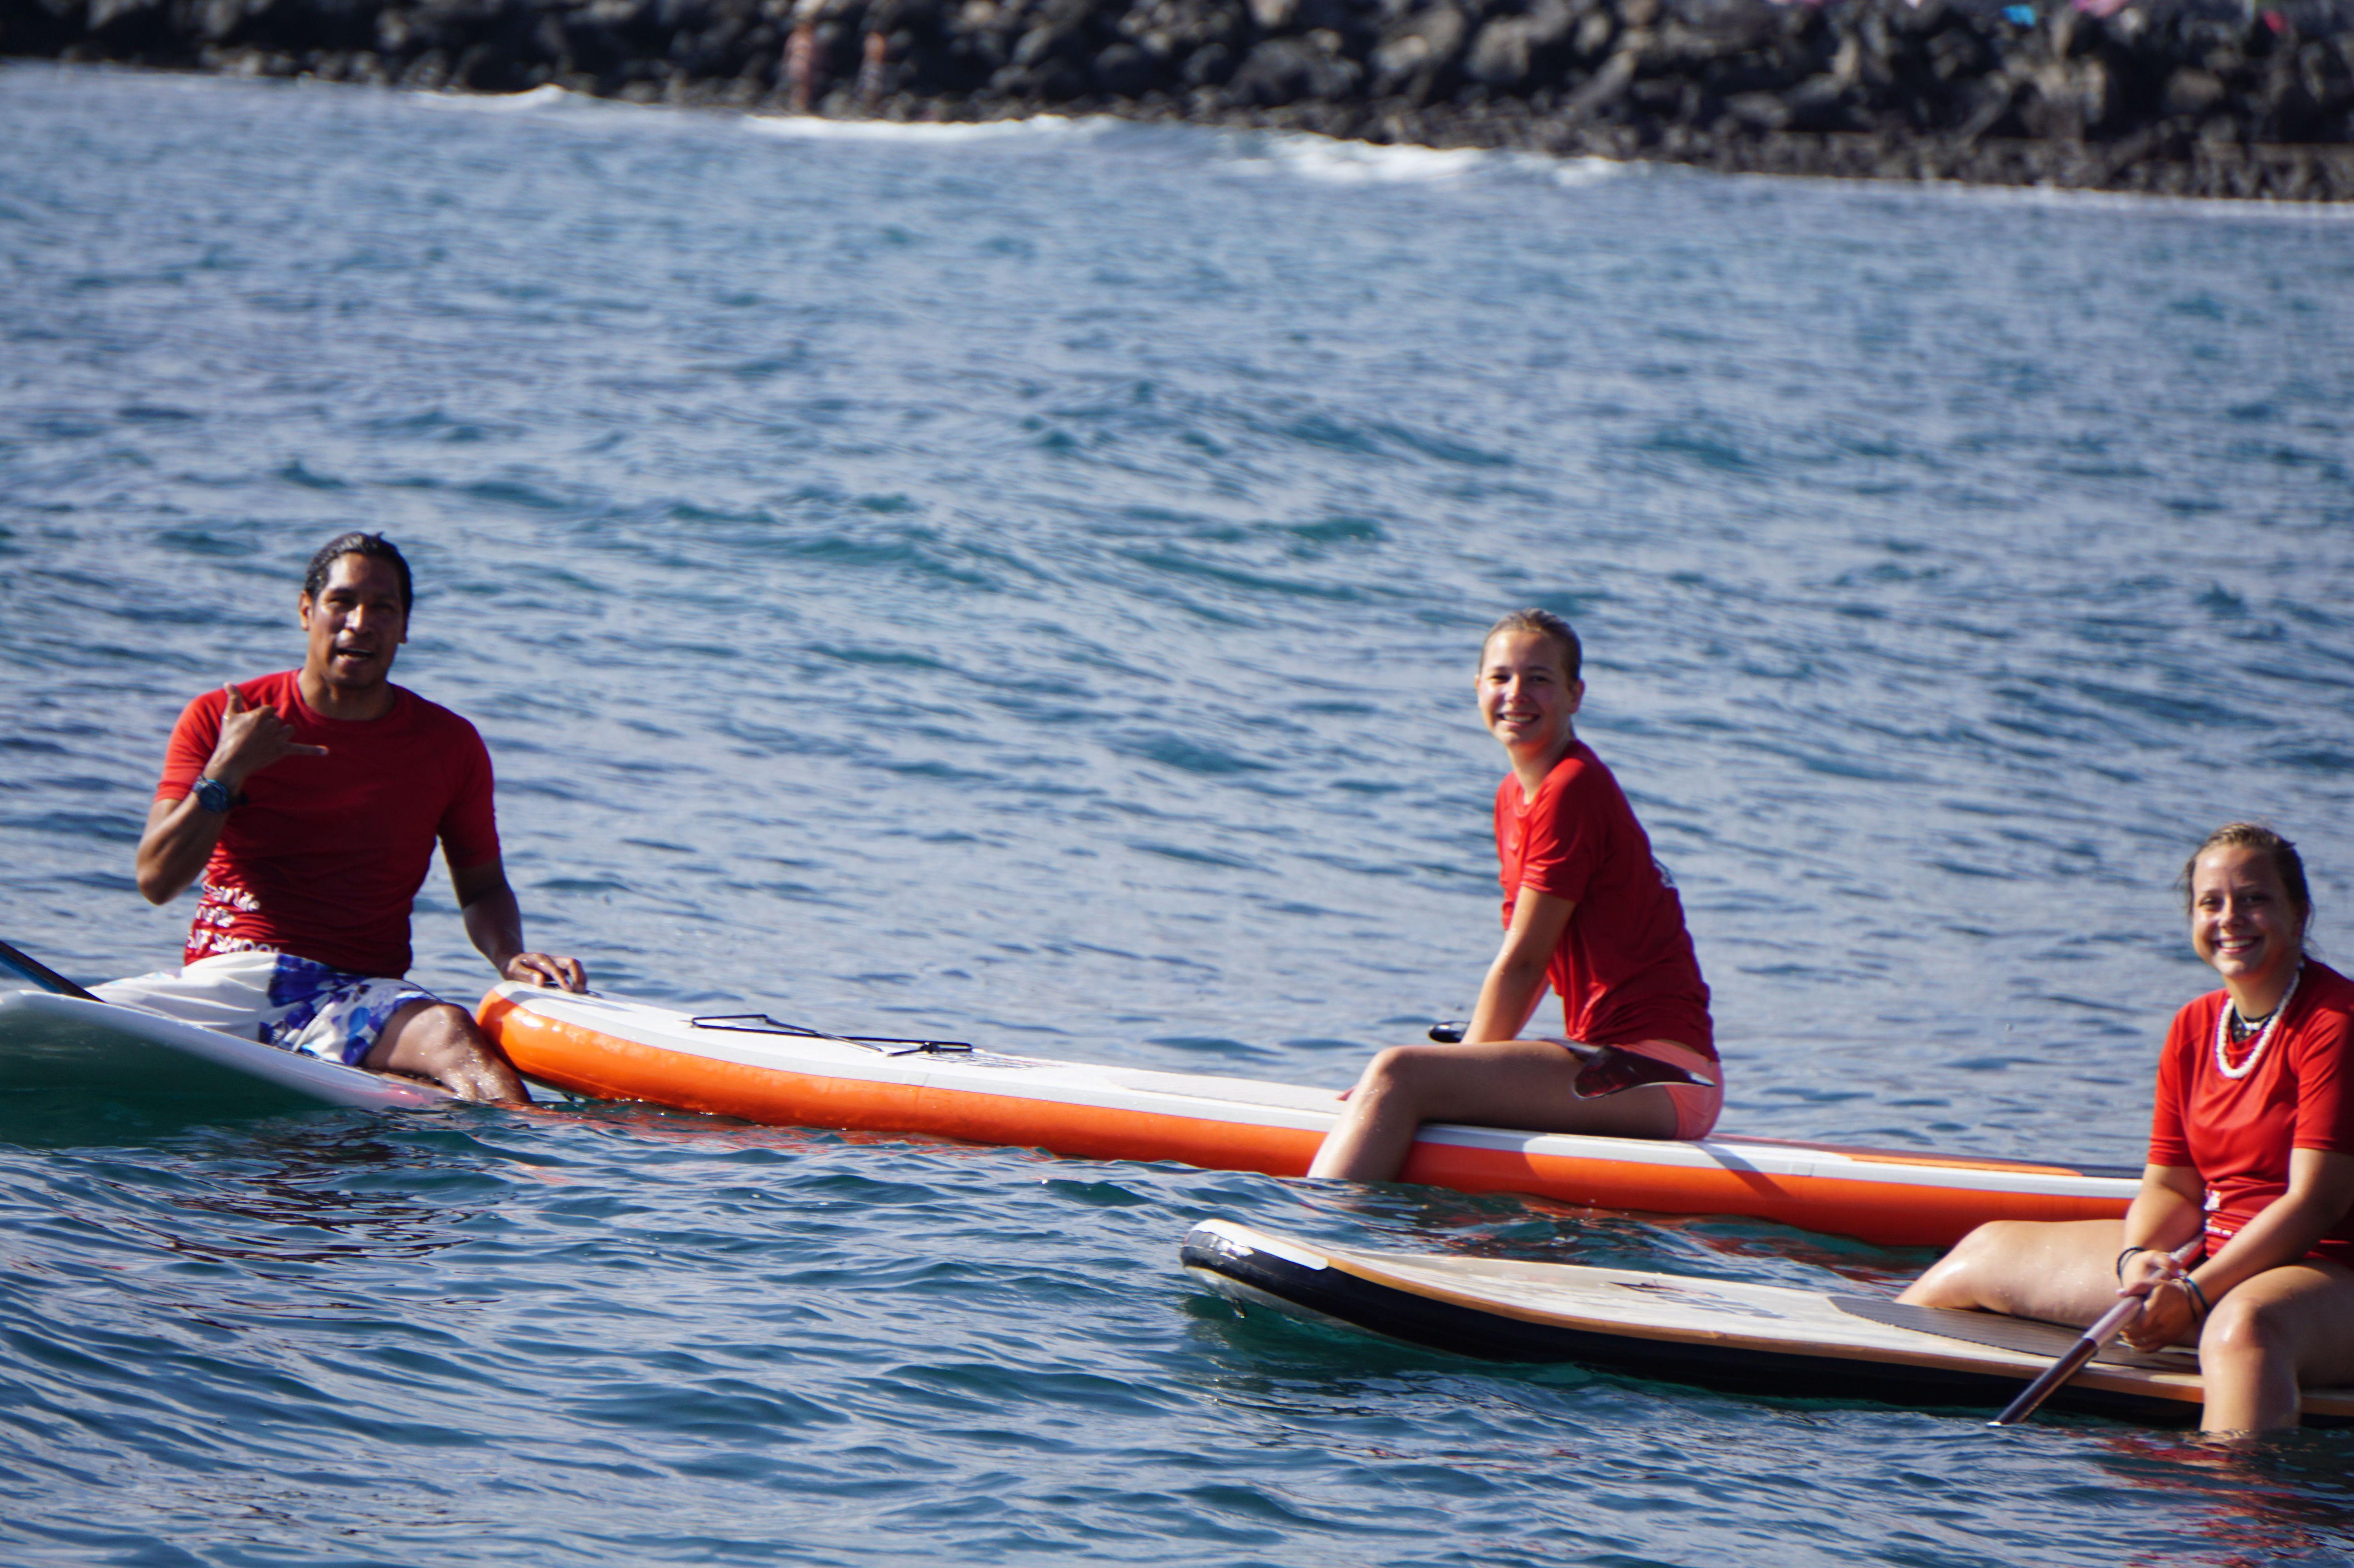 Paddel surf excursion ....happy faces